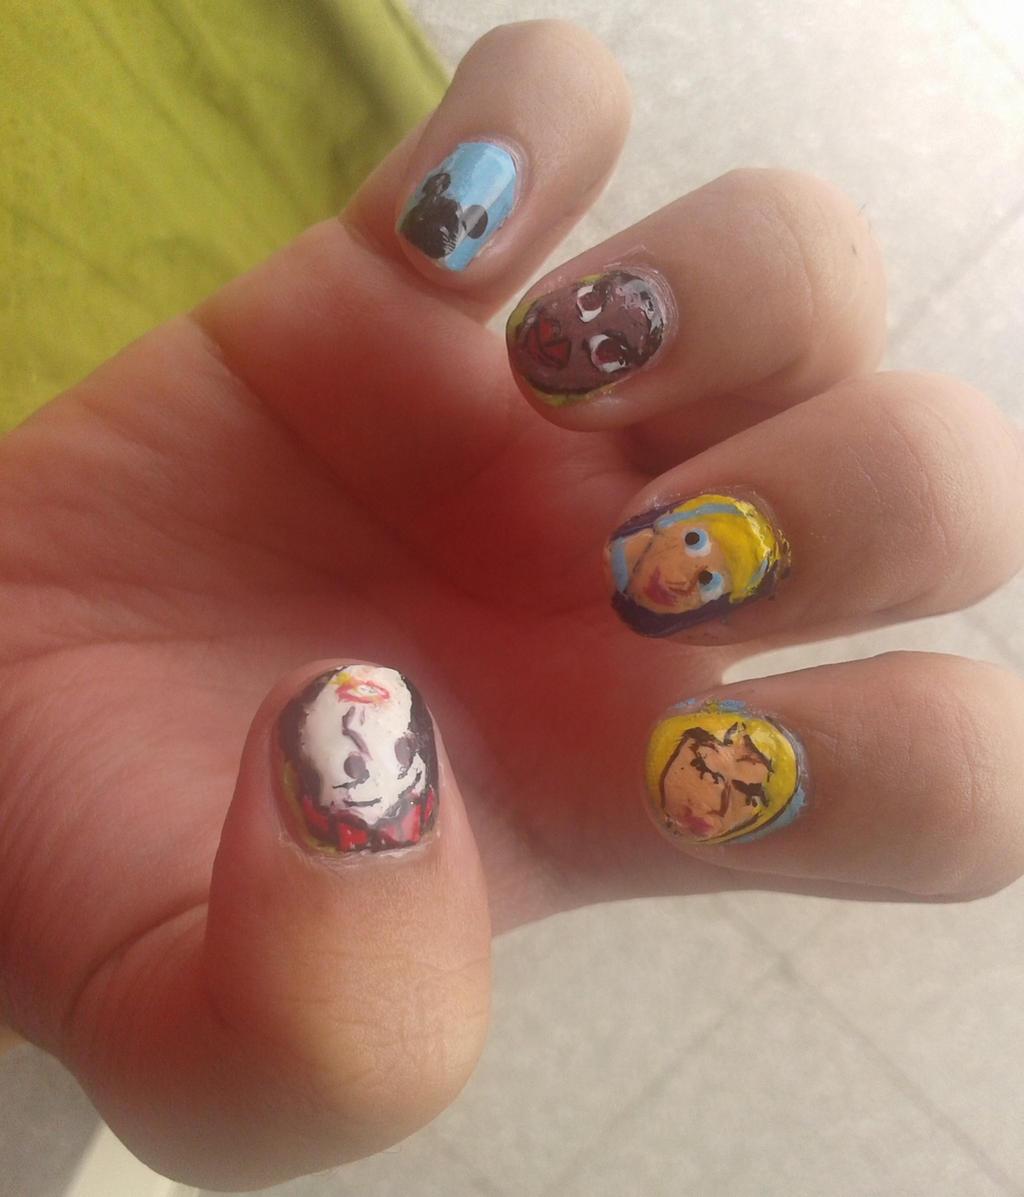 Disney Princess Tiana Waterfall Nail Art: Disney Princess Nail Art 2 By Iman-Imran On DeviantArt